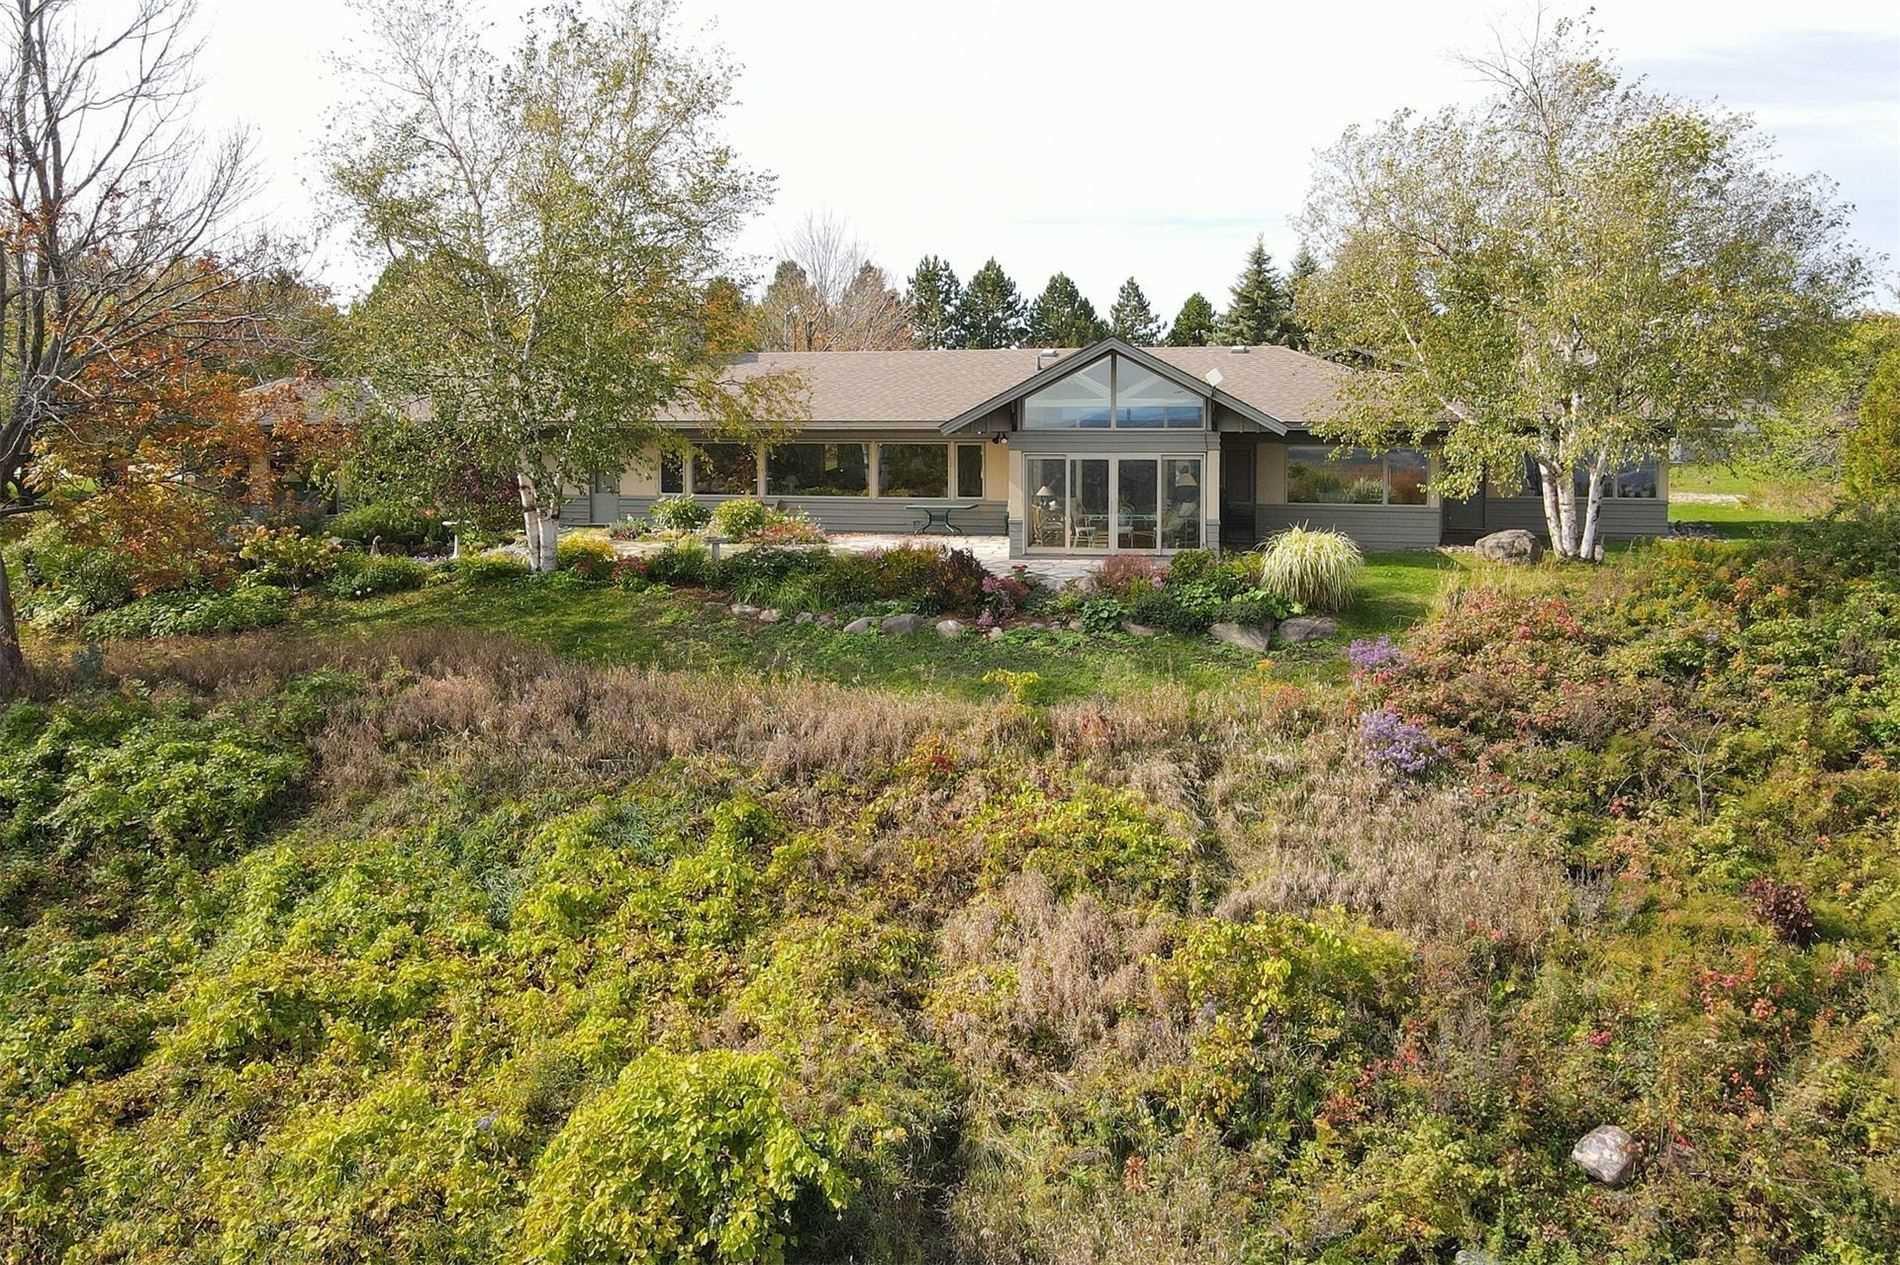 Main Photo: 798475 3rd Line in Mulmur: Rural Mulmur House (Bungalow) for sale : MLS®# X4806669